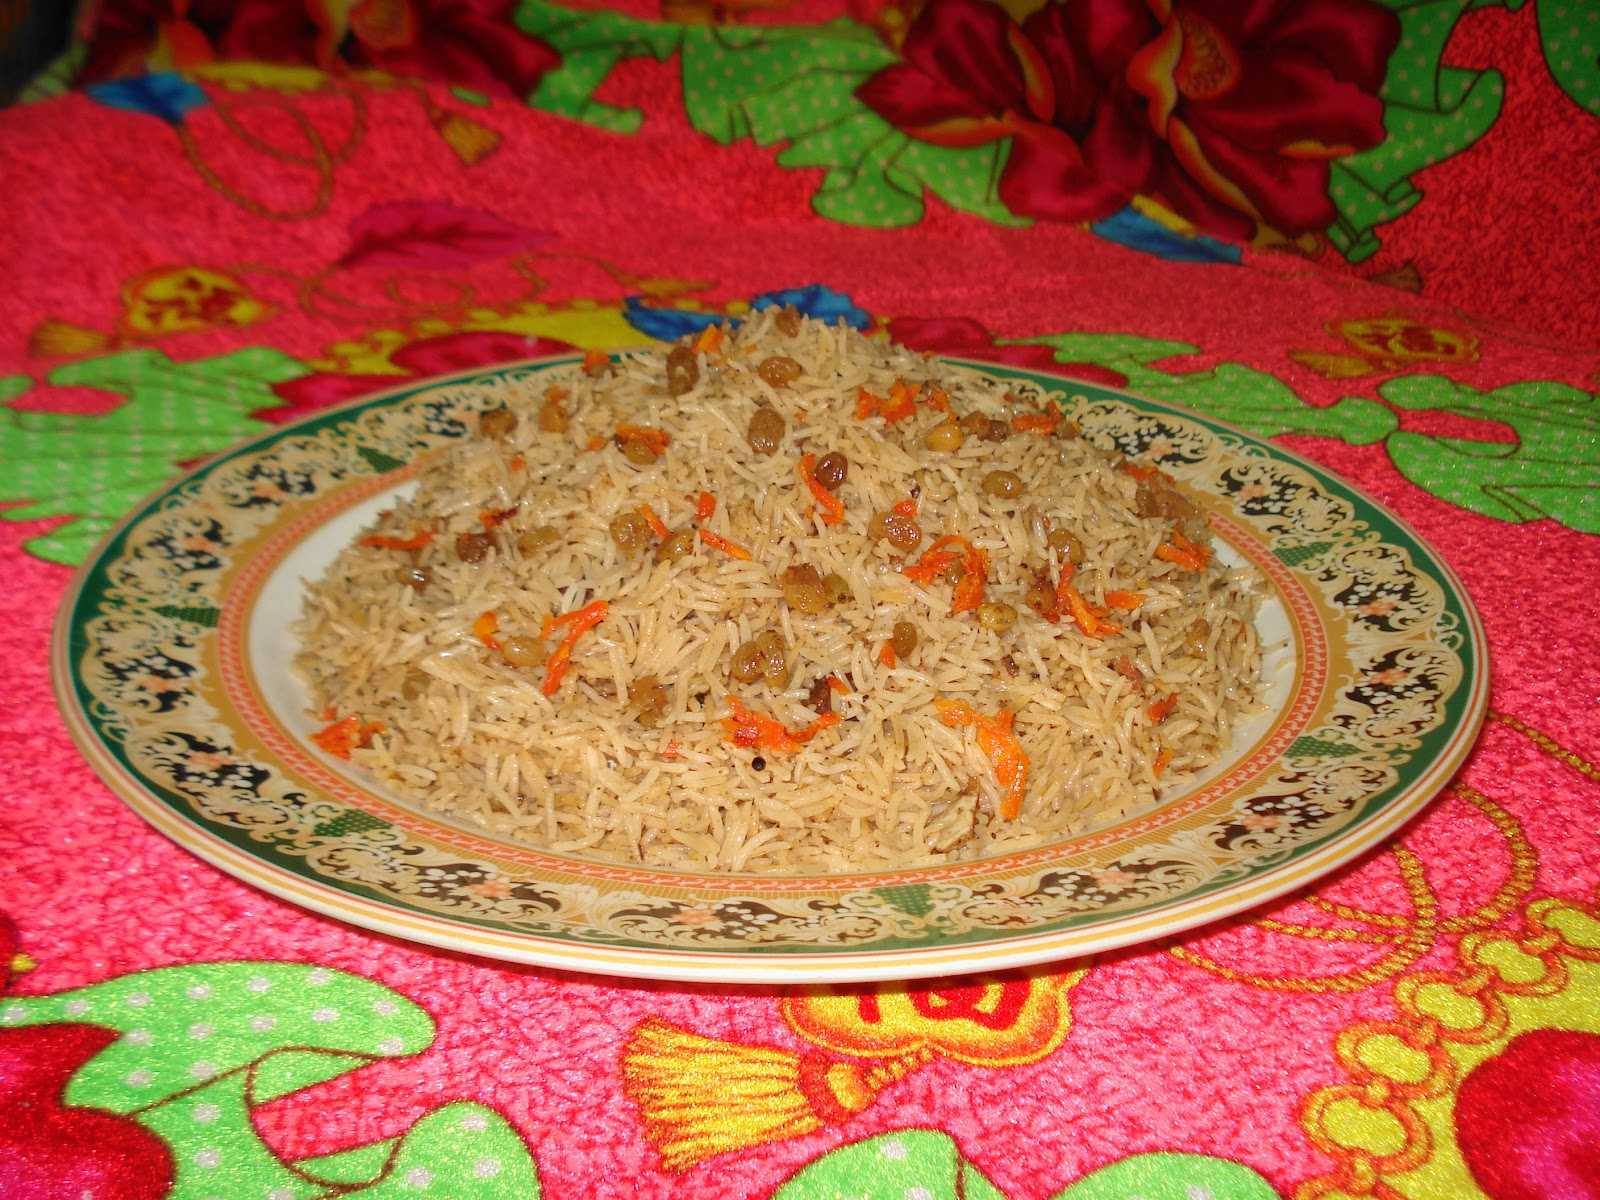 File:Afghani Pulao.JPG - Wikimedia Commons